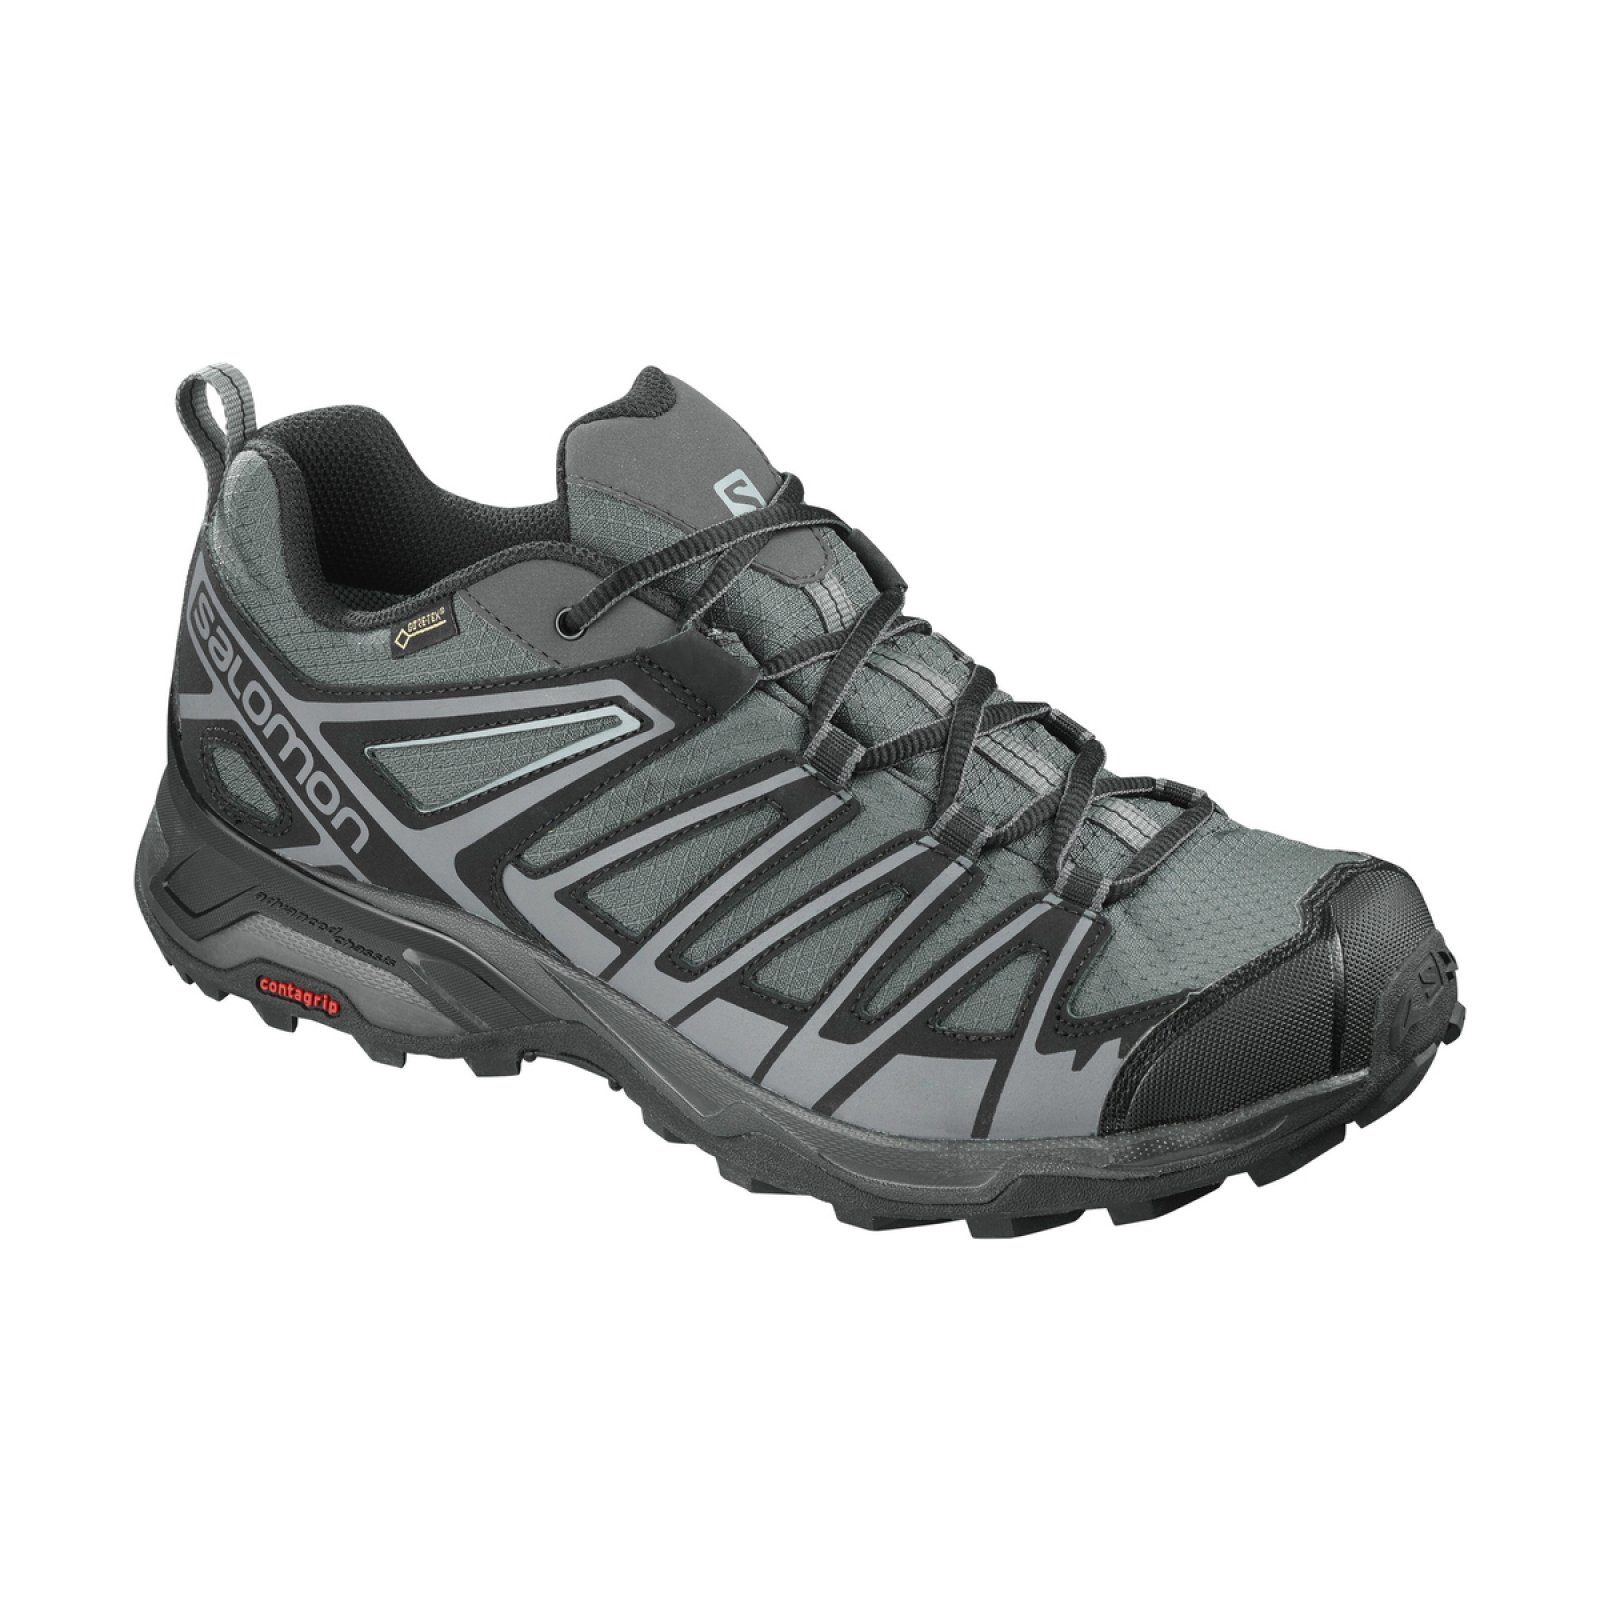 Outdoorové boty Salomon X Ultra 3 Prime GTX M L40246100 - Actisport.cz 45a87289c4a